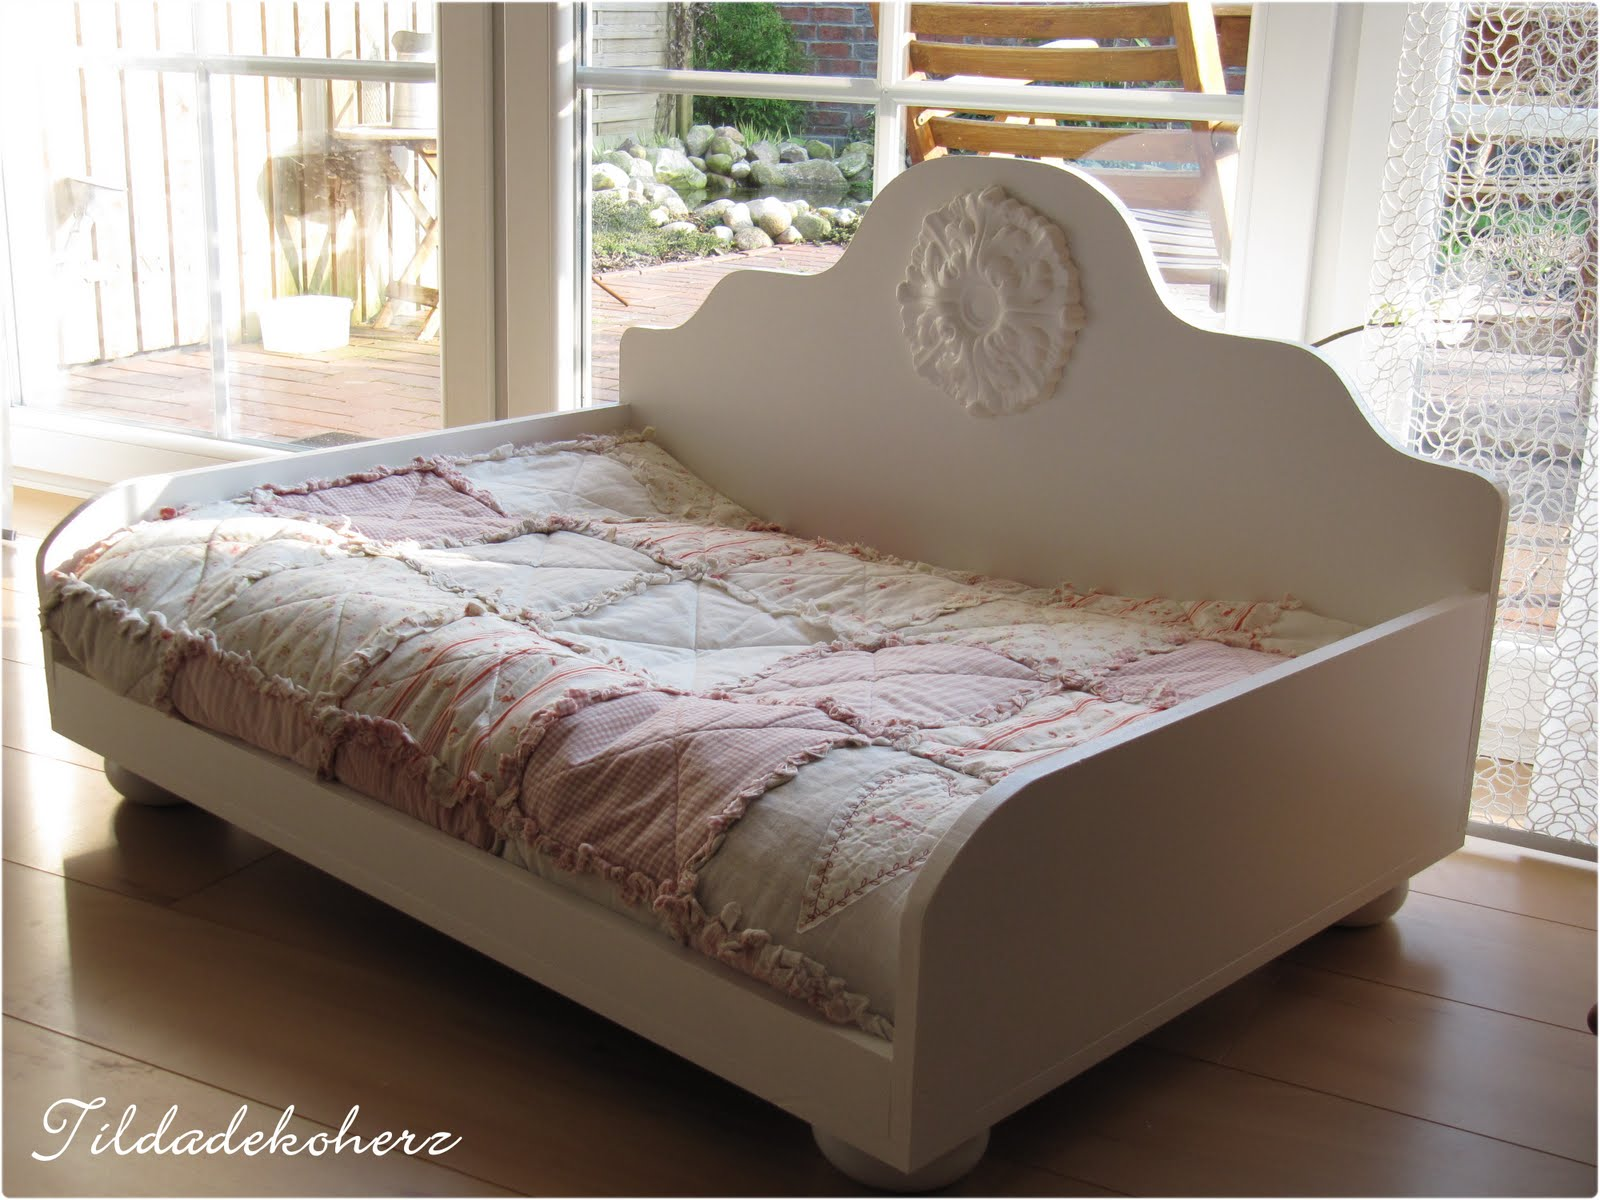 aussentreppe holz bauanleitung. Black Bedroom Furniture Sets. Home Design Ideas